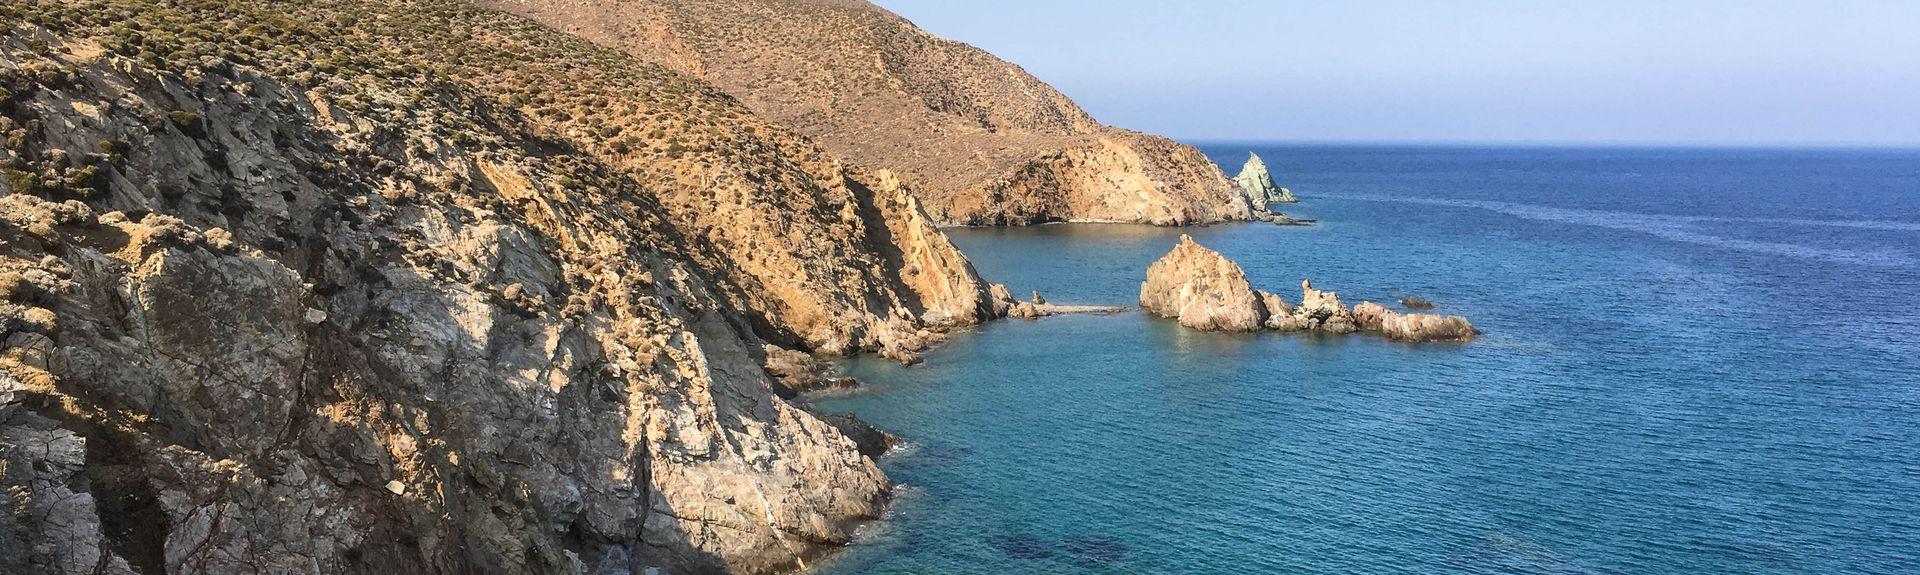 Mykonos New Port, Tourlos, Aegean, Greece